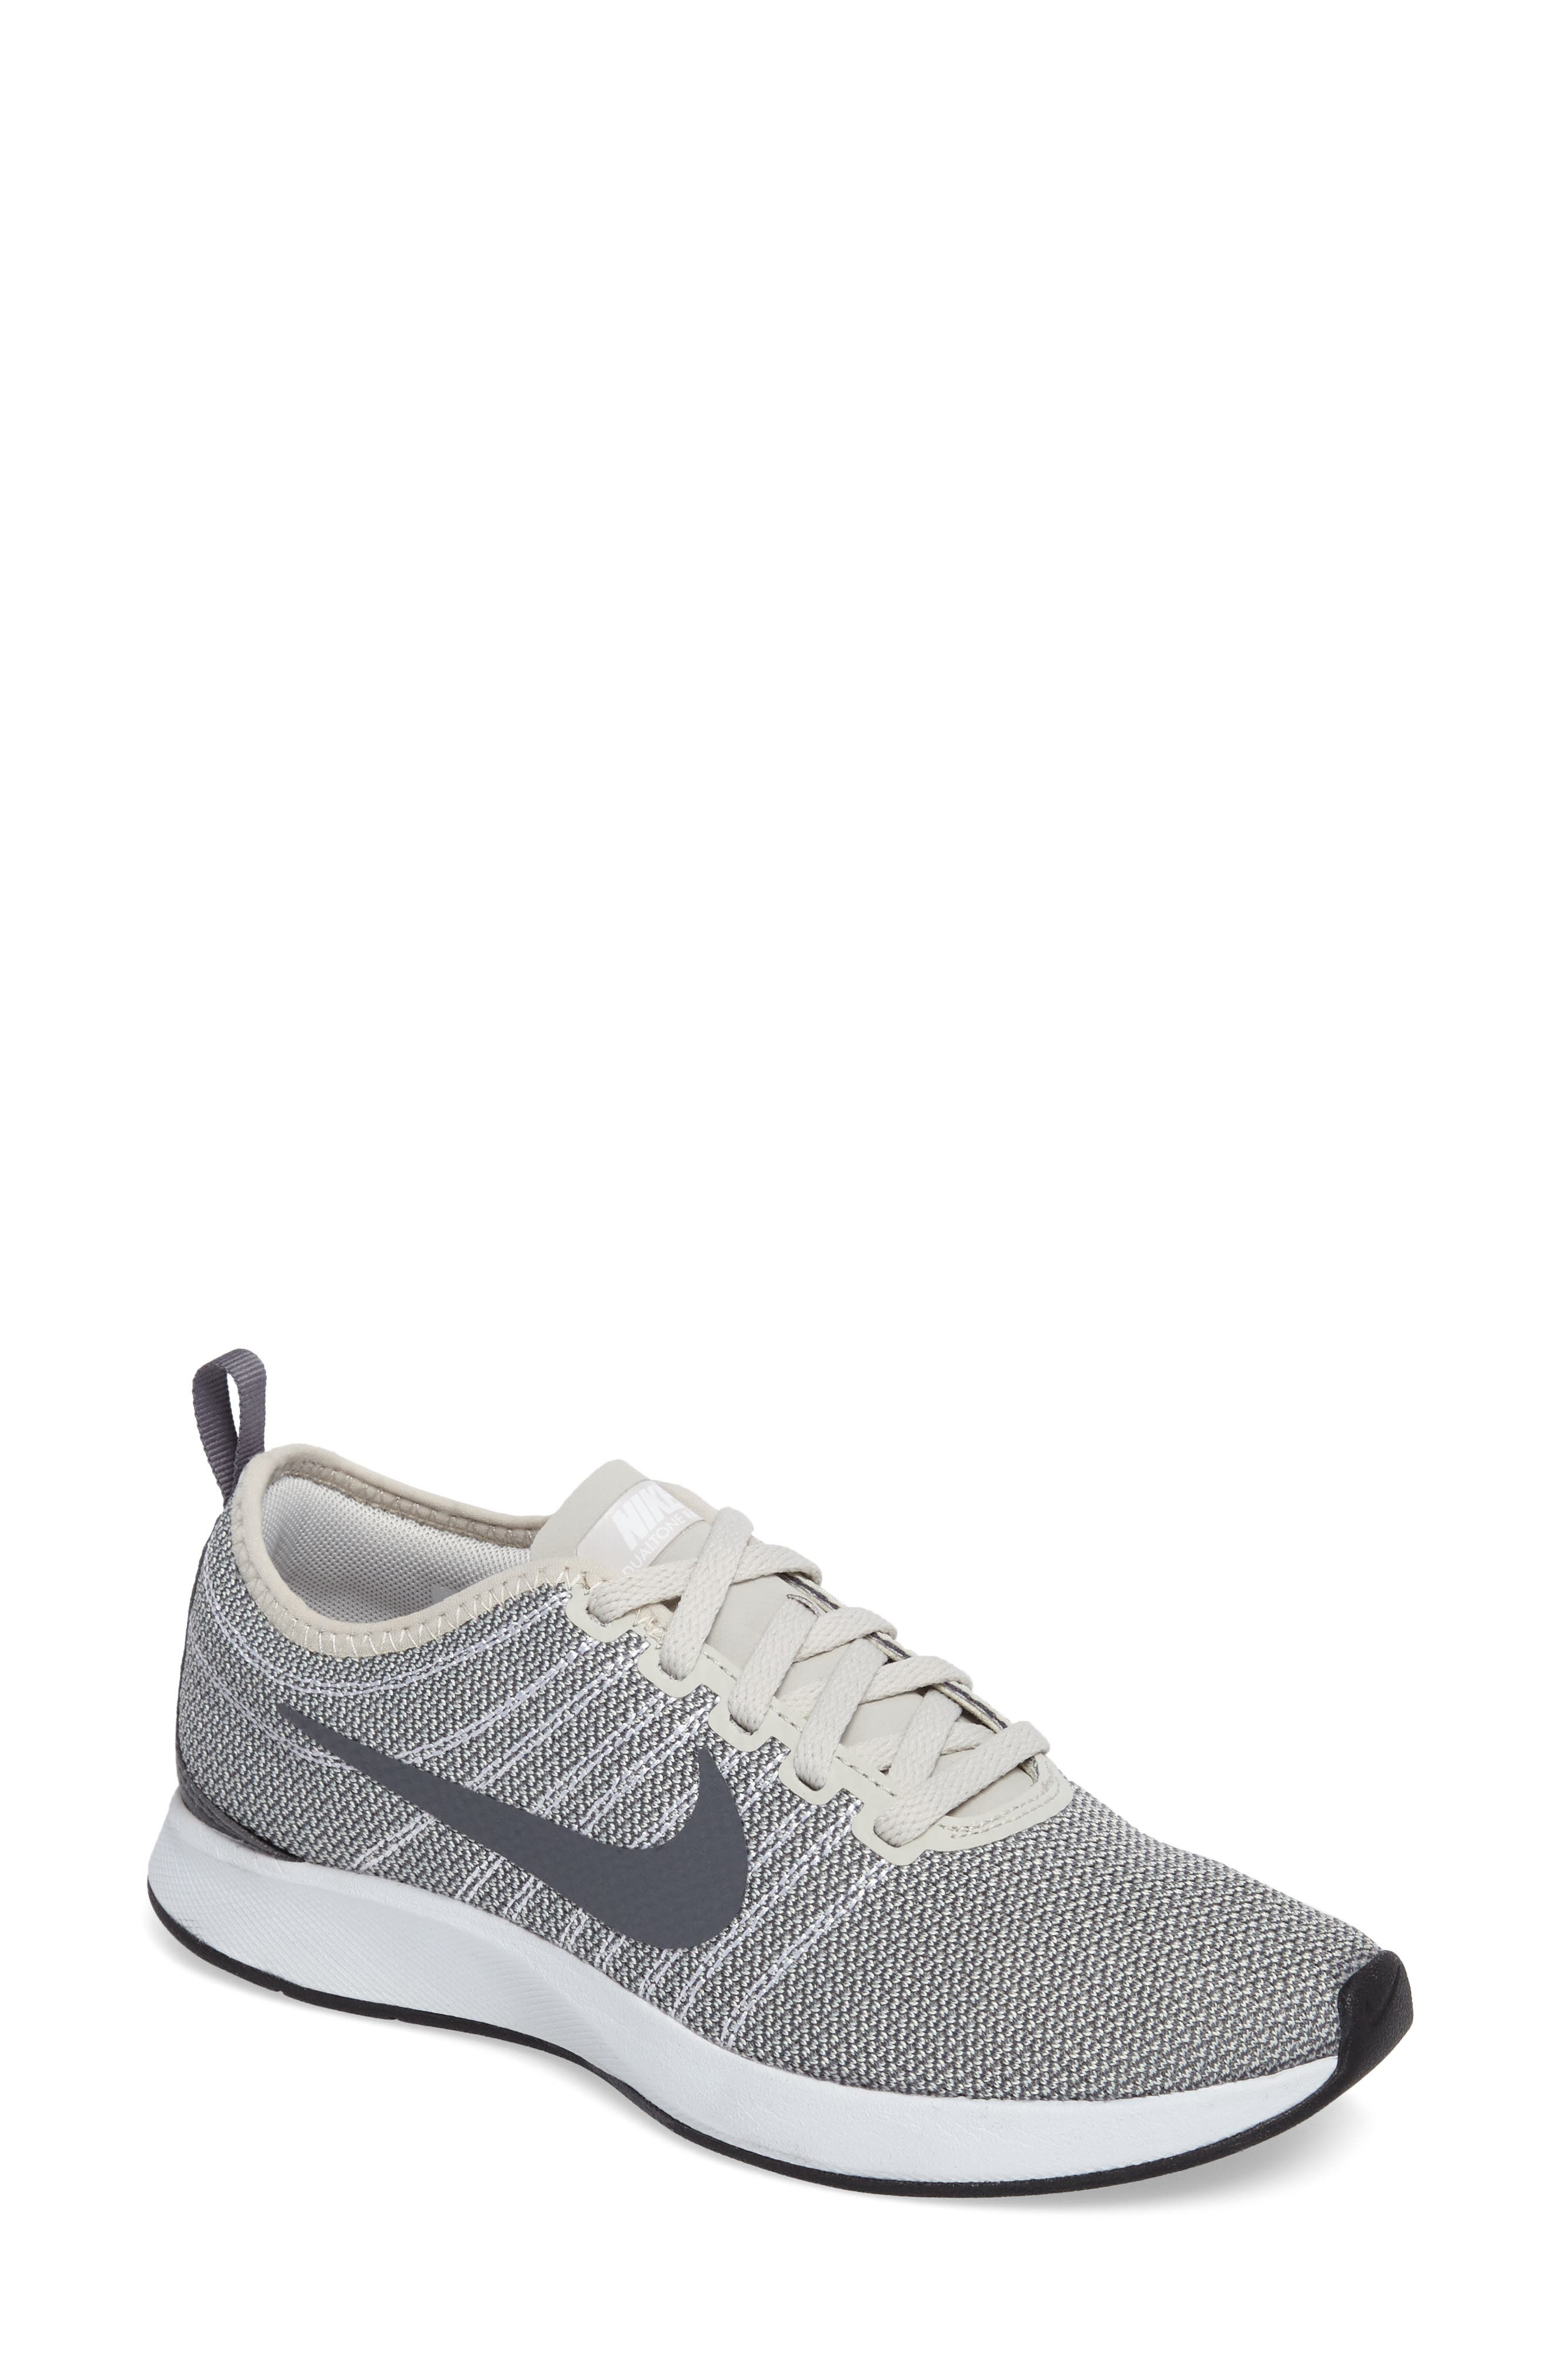 Alternate Image 1 Selected - Nike Dualtone Racer Running Shoe (Women)